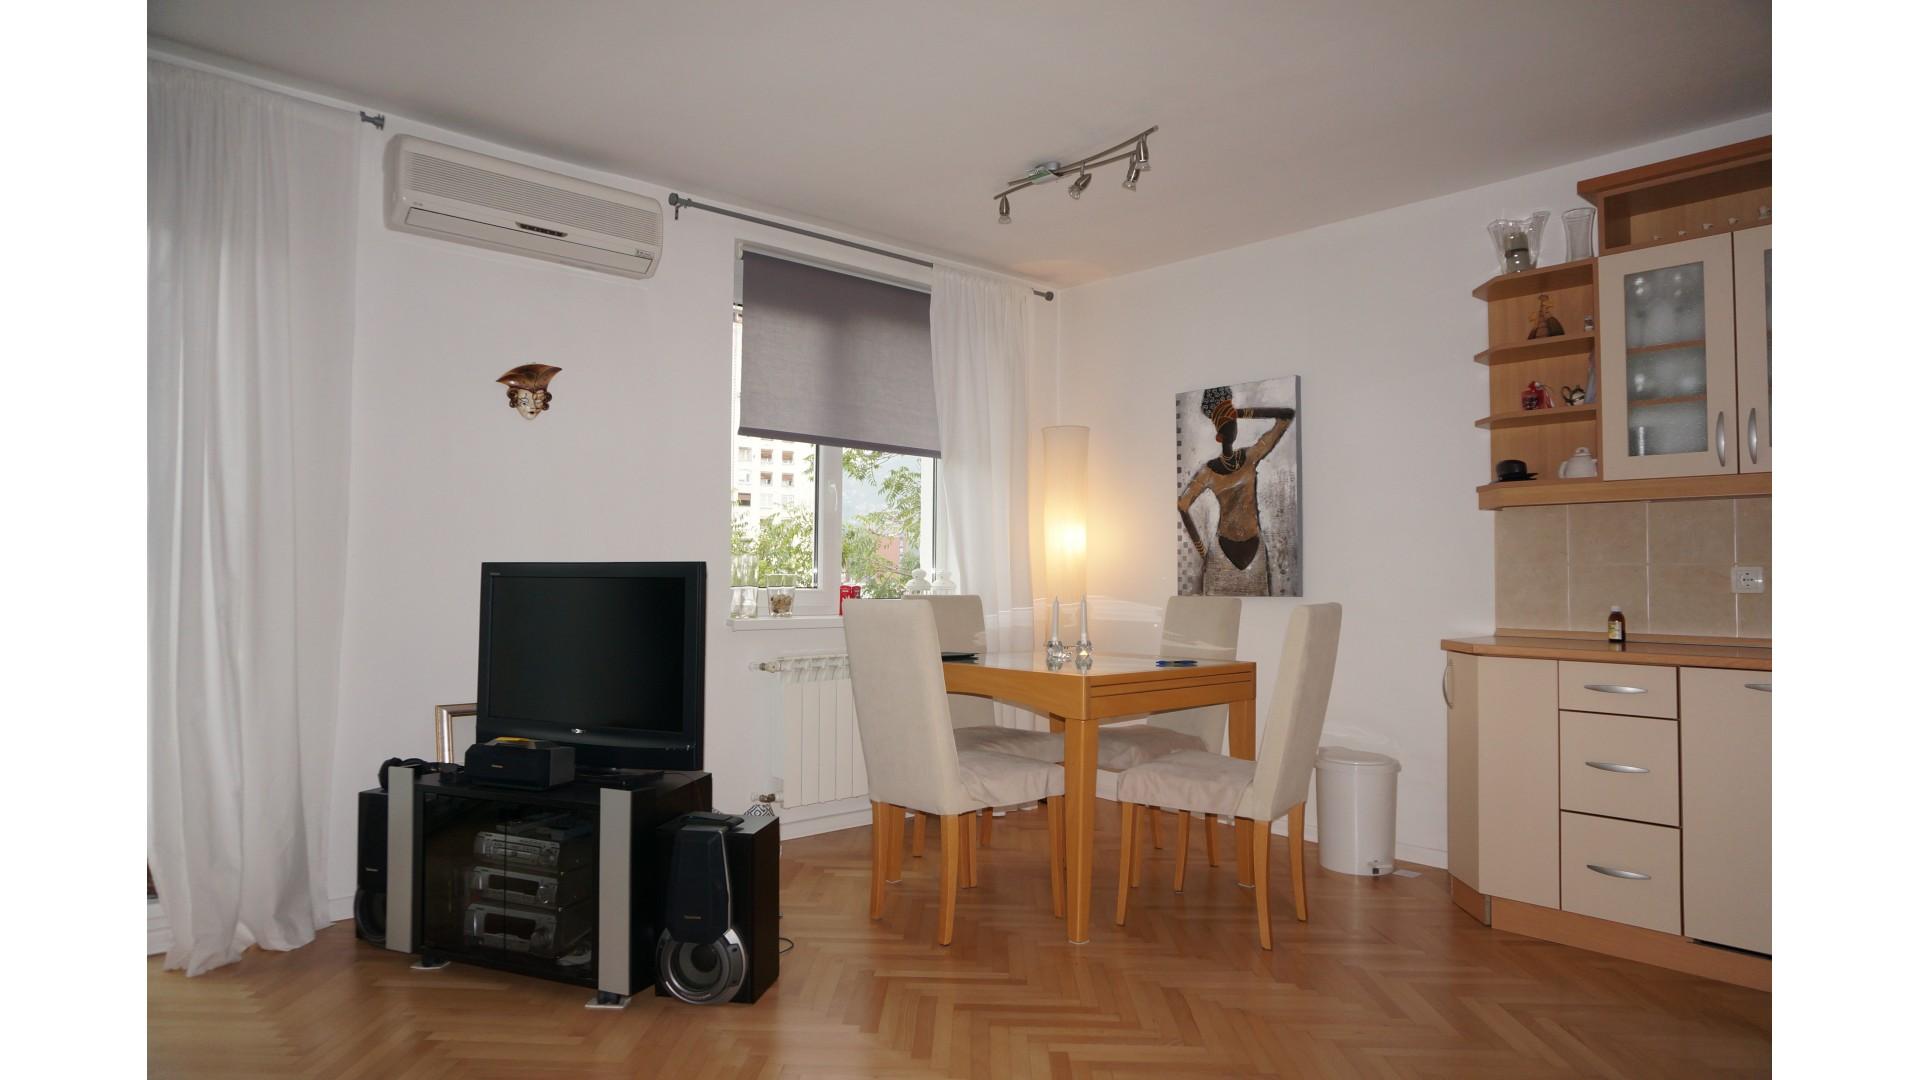 Lijep stan u centru grada 55 m2